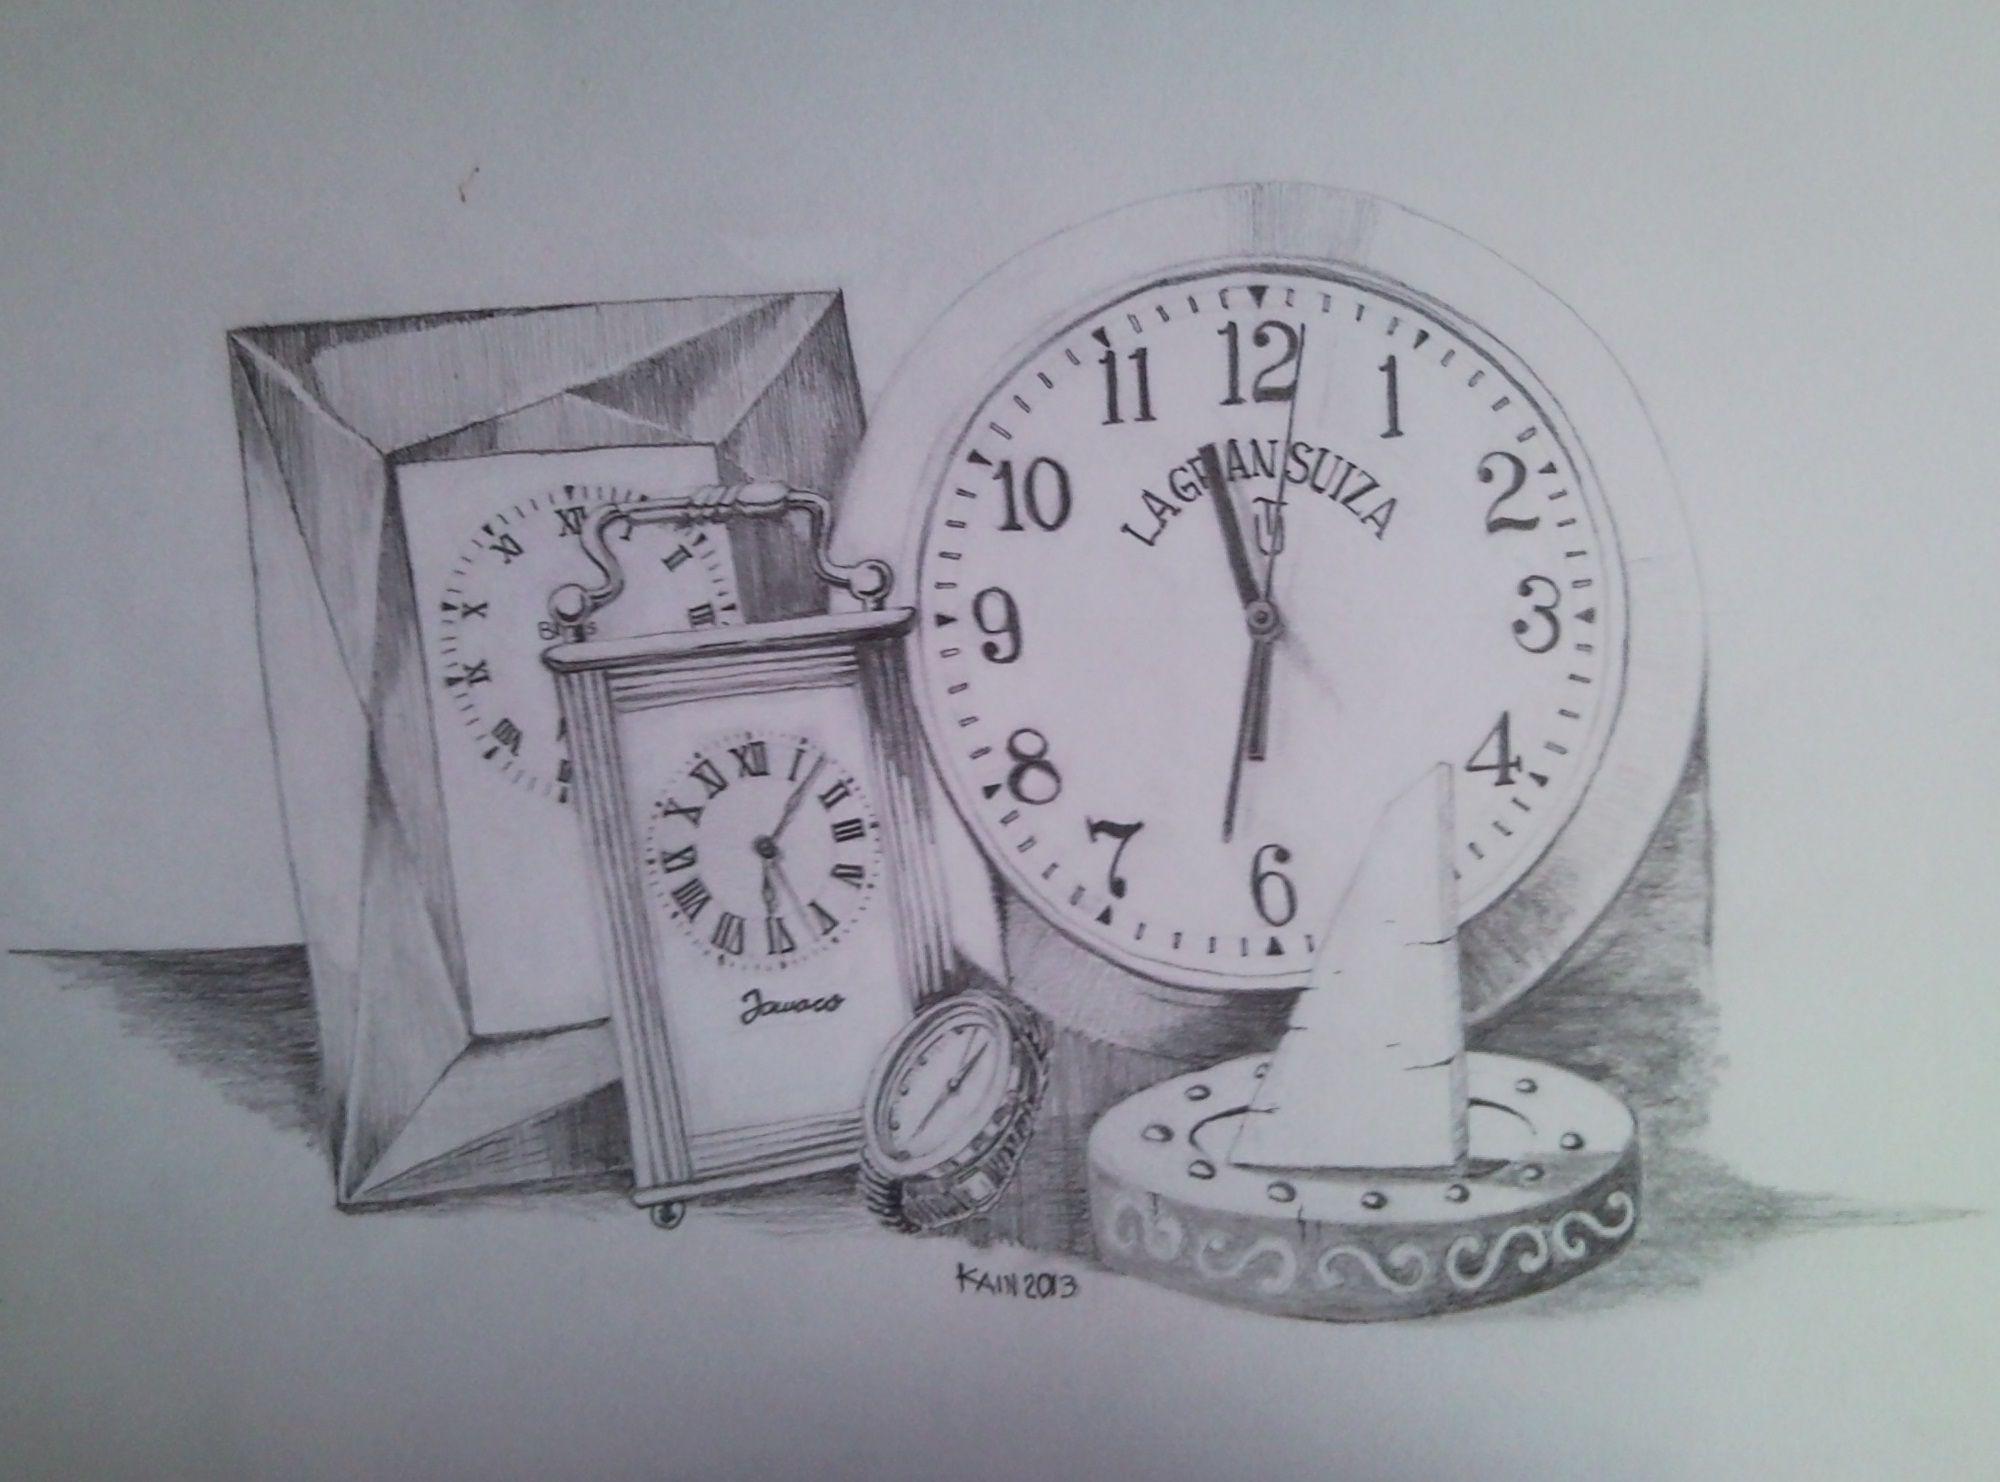 Worksheet. Tiempo Ejercicio de dibujo de relojes a lpiz grafito tomado